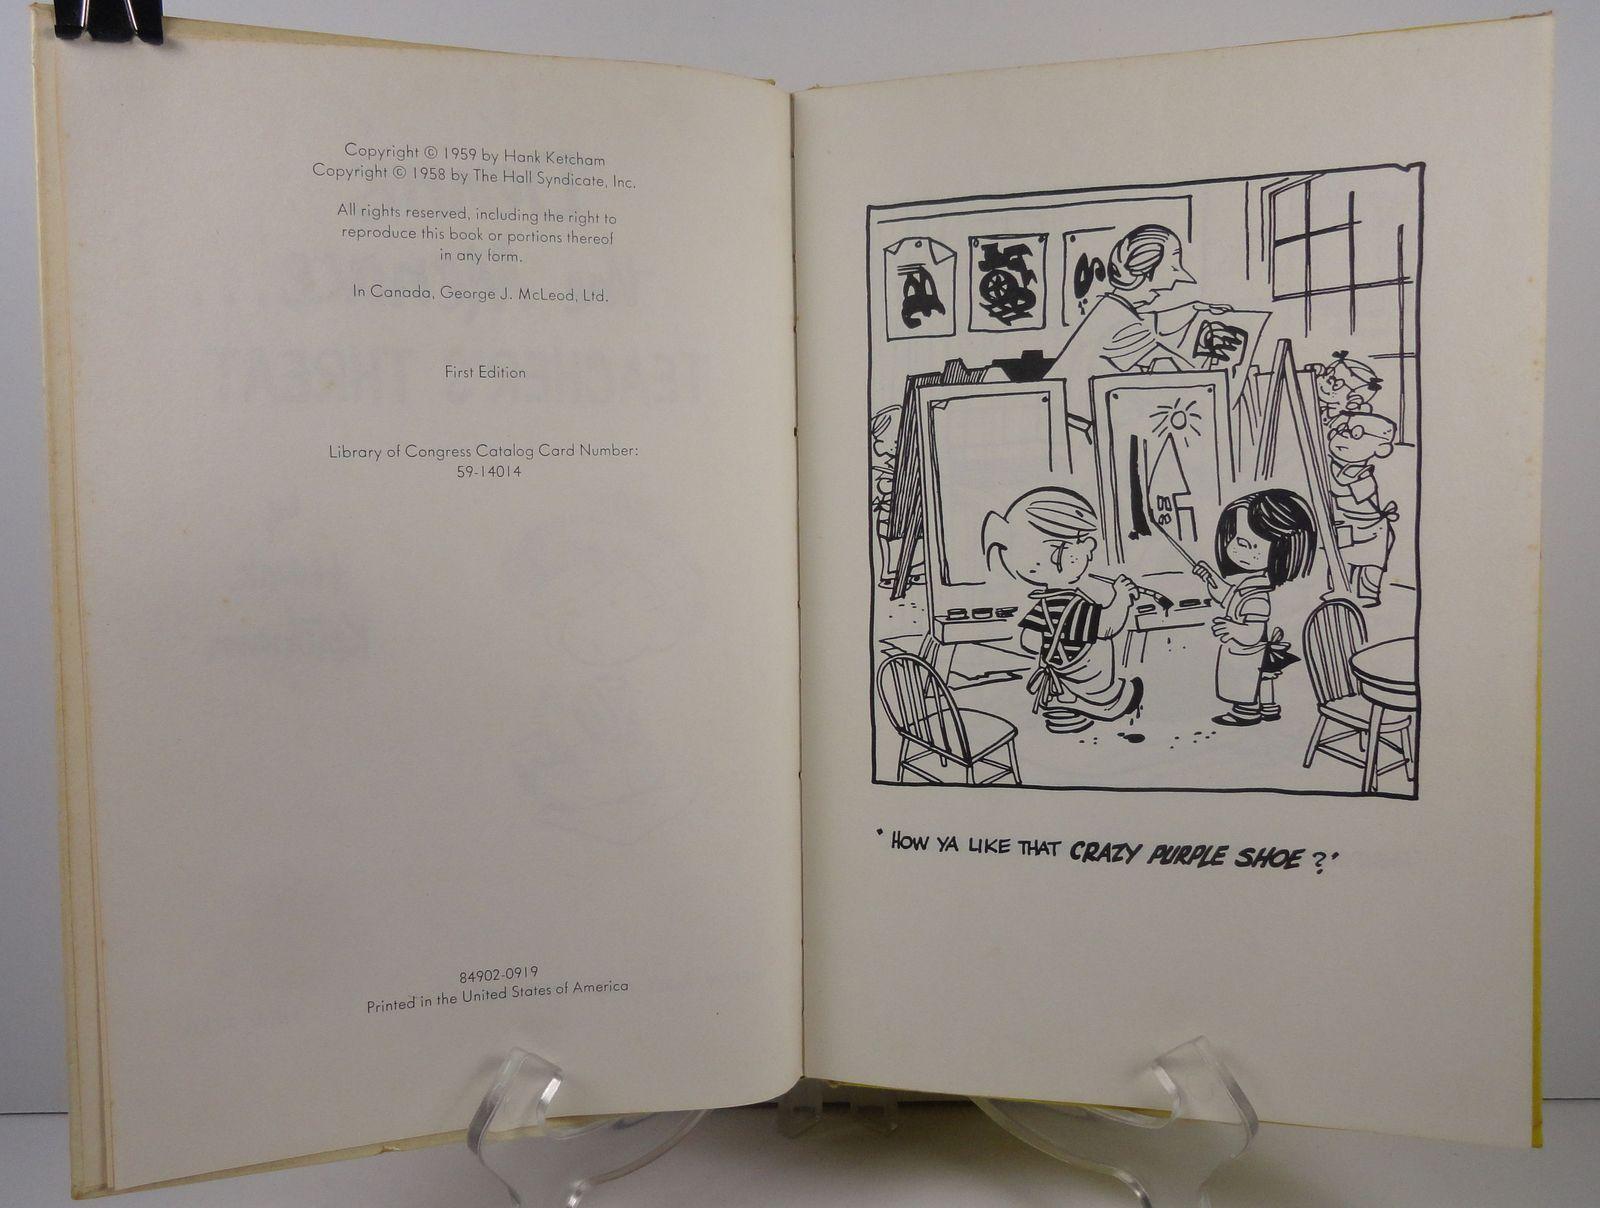 Dennis the Menace Teacher's Threat by Hank Ketcham 1959 Holt